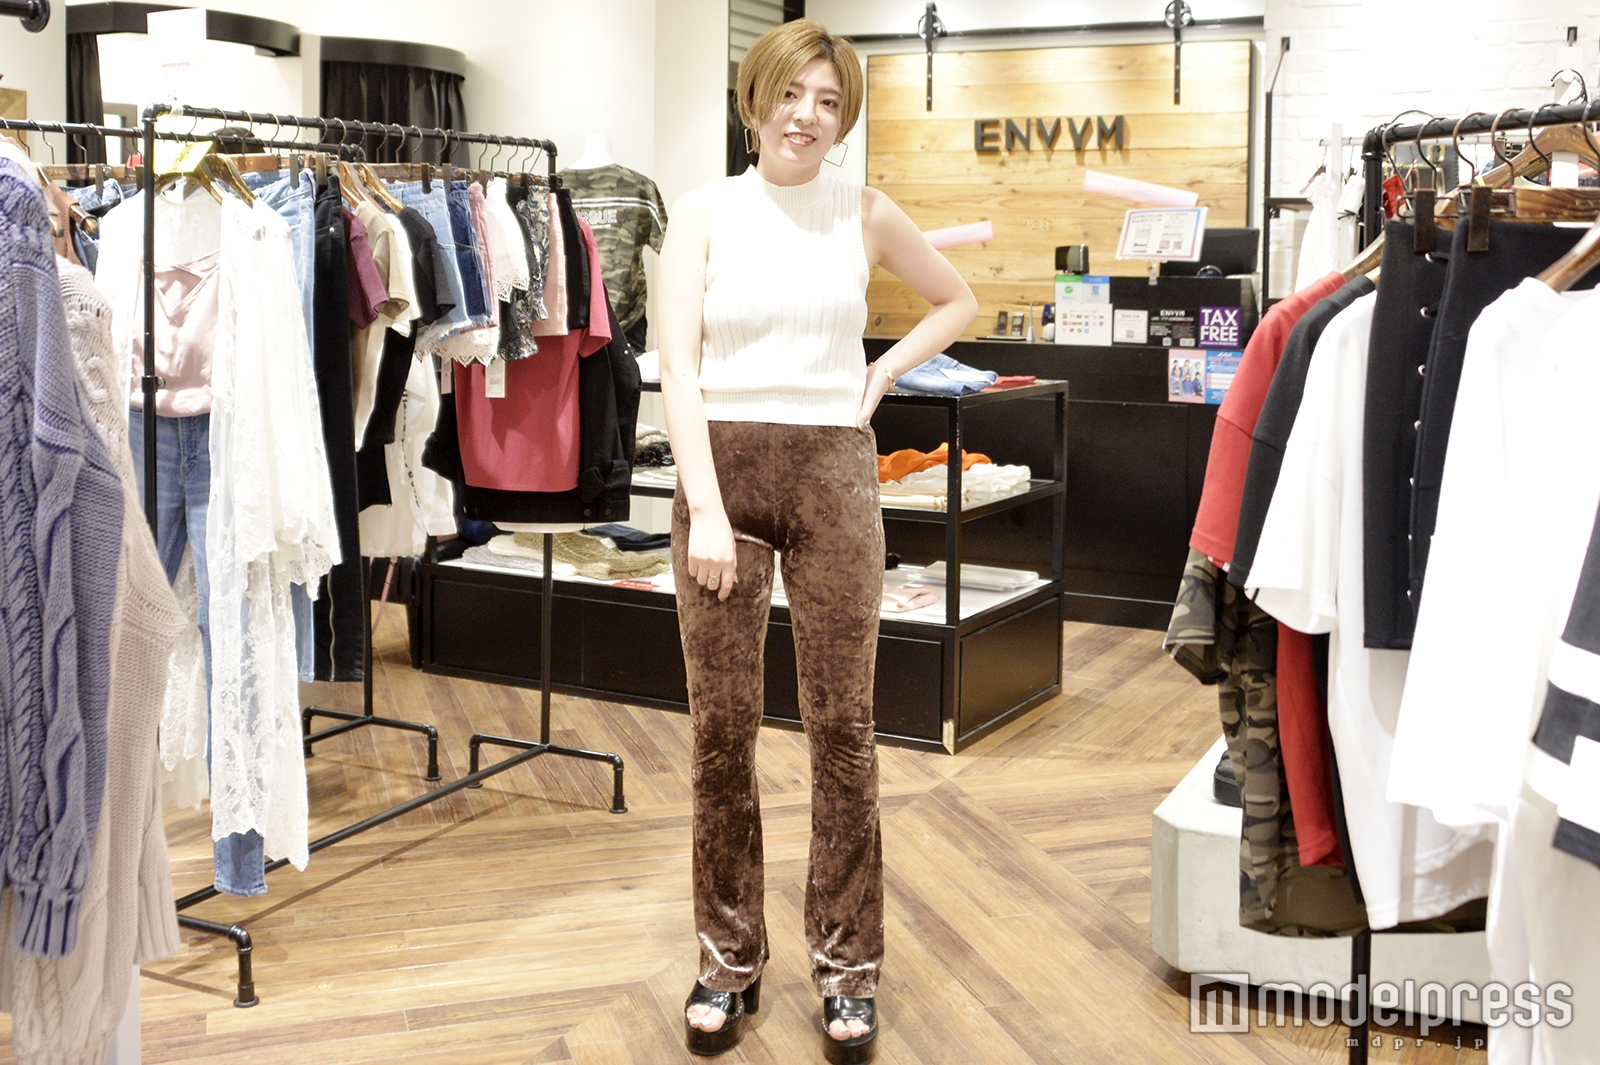 「ENVYM」渋谷109店で取材を実施(C)モデルプレス